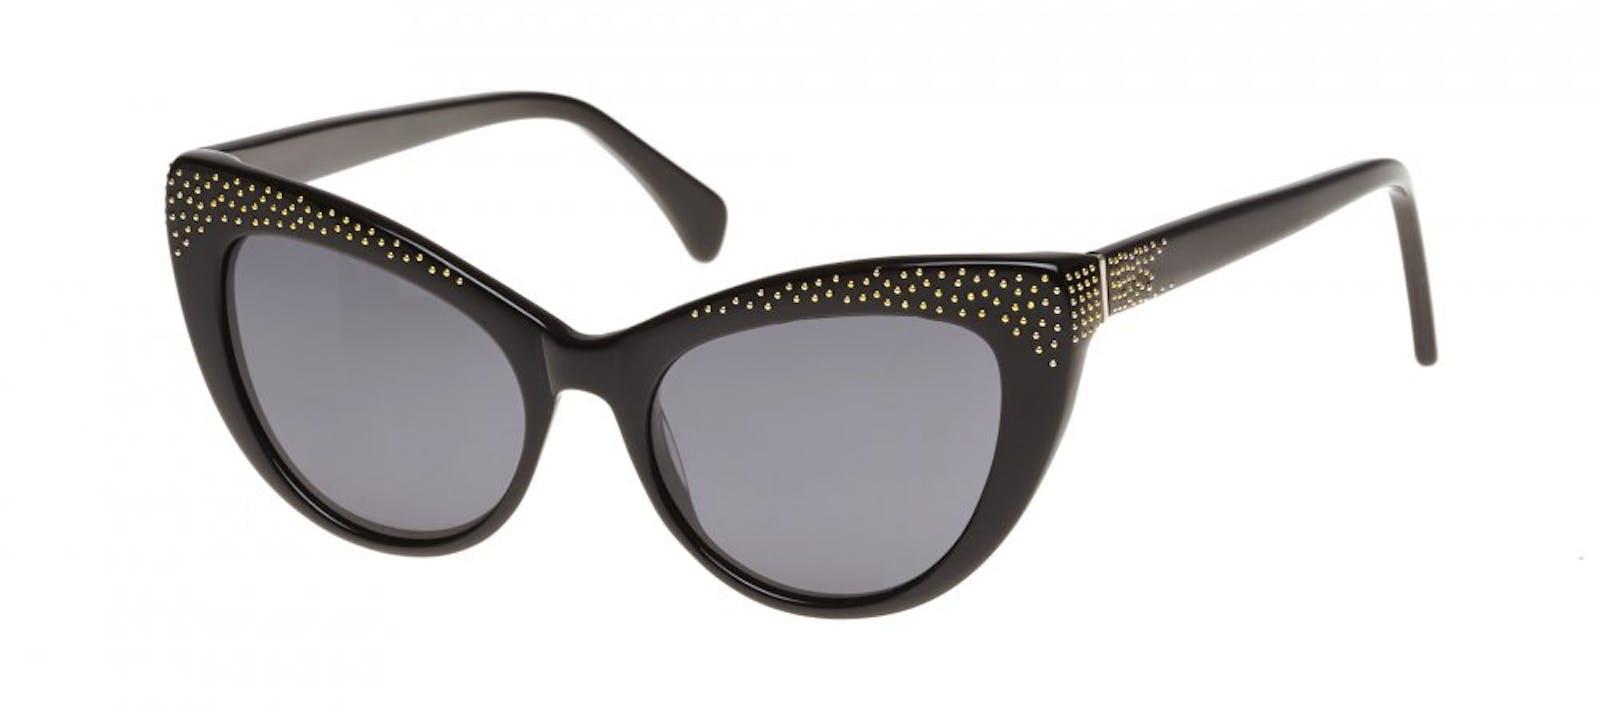 c066308d796 Affordable Fashion Glasses Cat Eye Daring Cateye Sunglasses Women Keiko  Roxy Noir Tilt